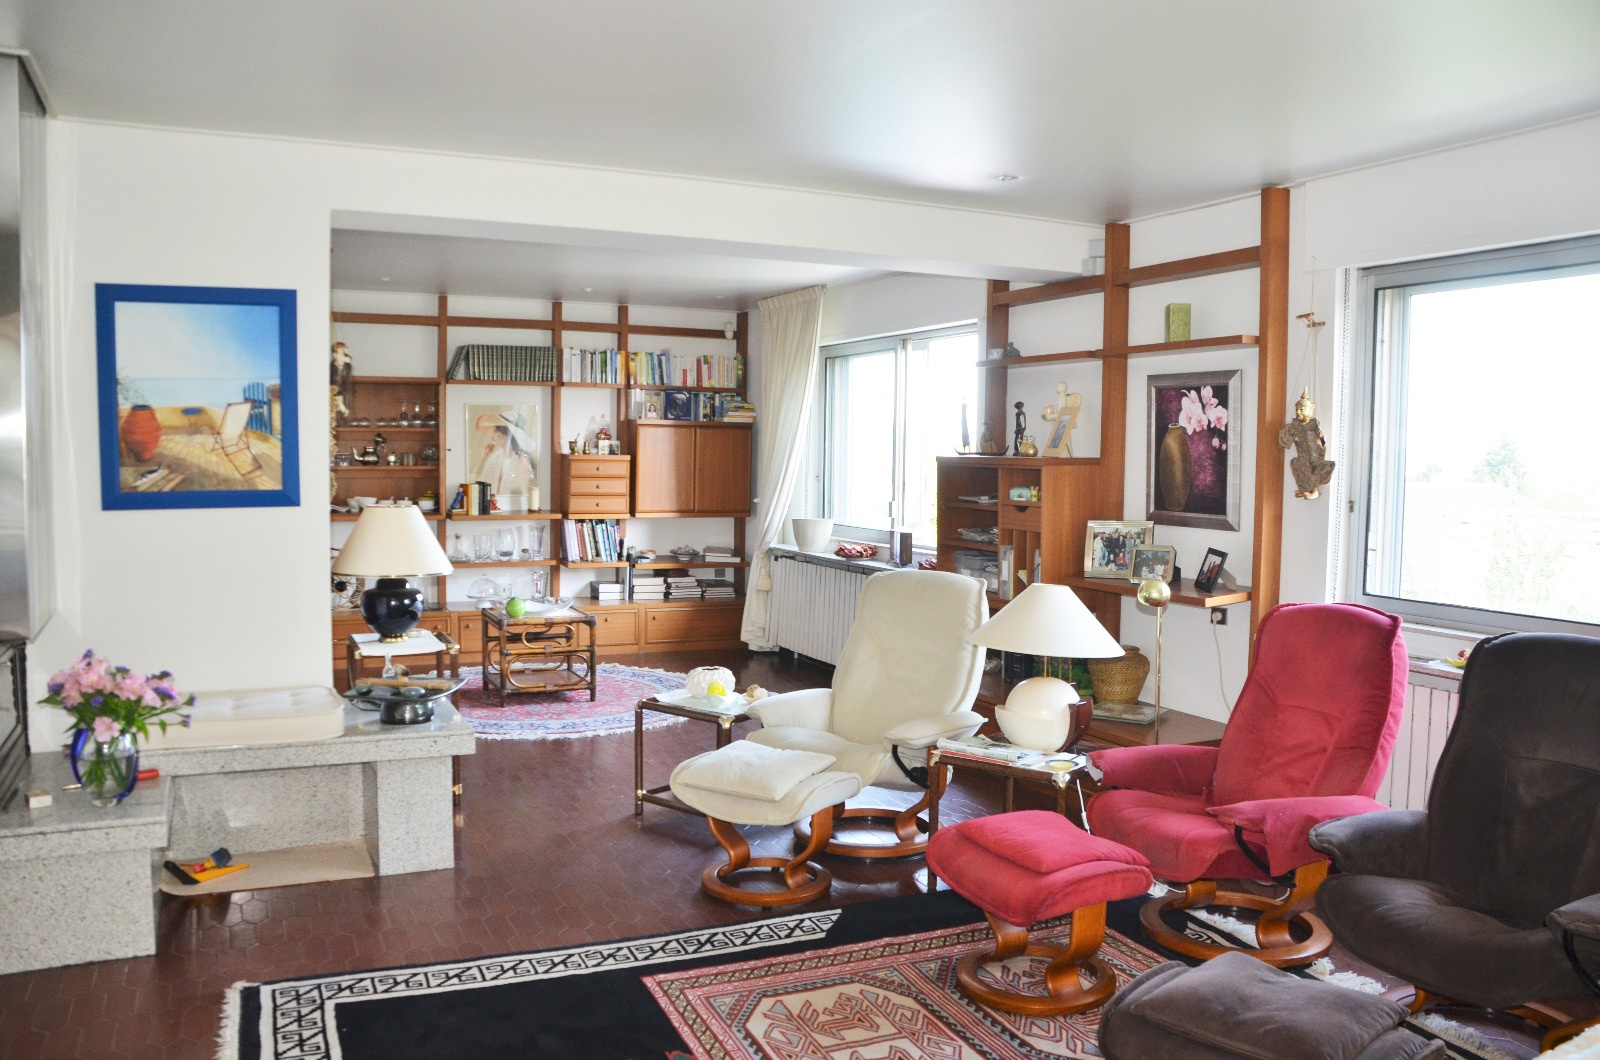 viager maison villa saverne propriete exceptionnelle a vendre en viager occupe. Black Bedroom Furniture Sets. Home Design Ideas